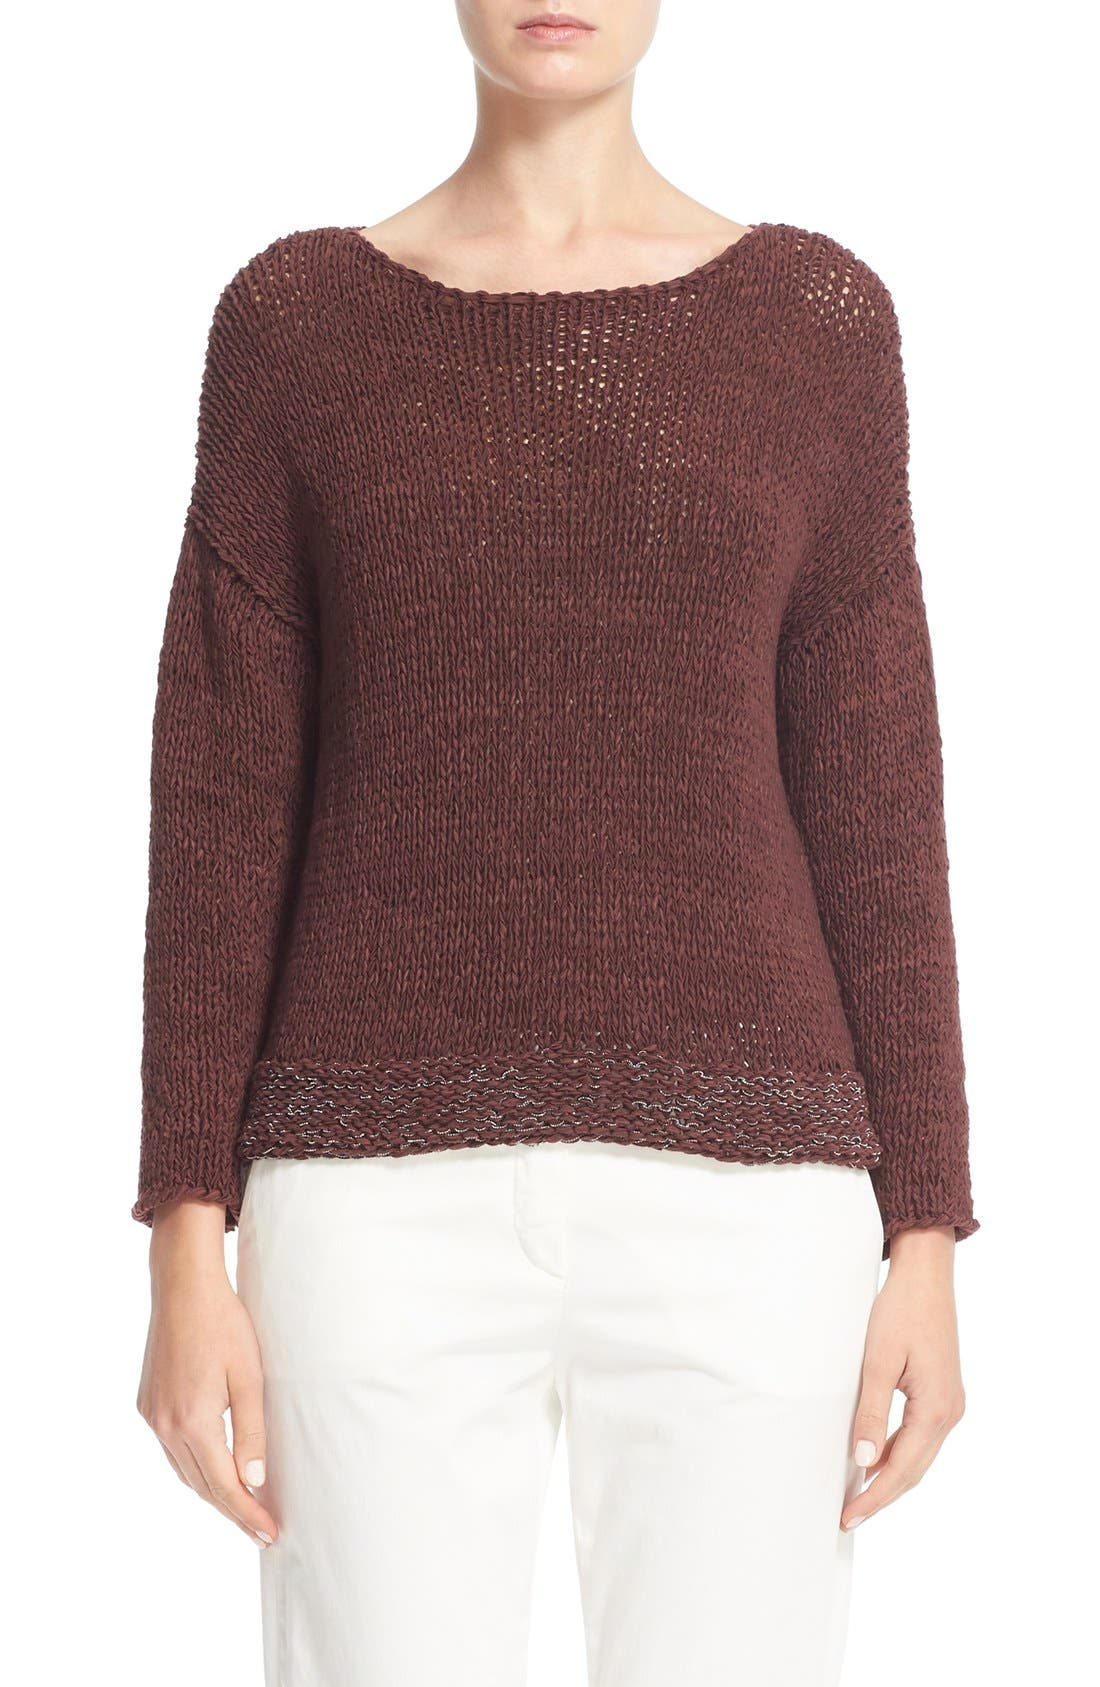 Alternate Image 1 Selected - Fabiana Filippi Mollini Trim Cotton Blend Sweater